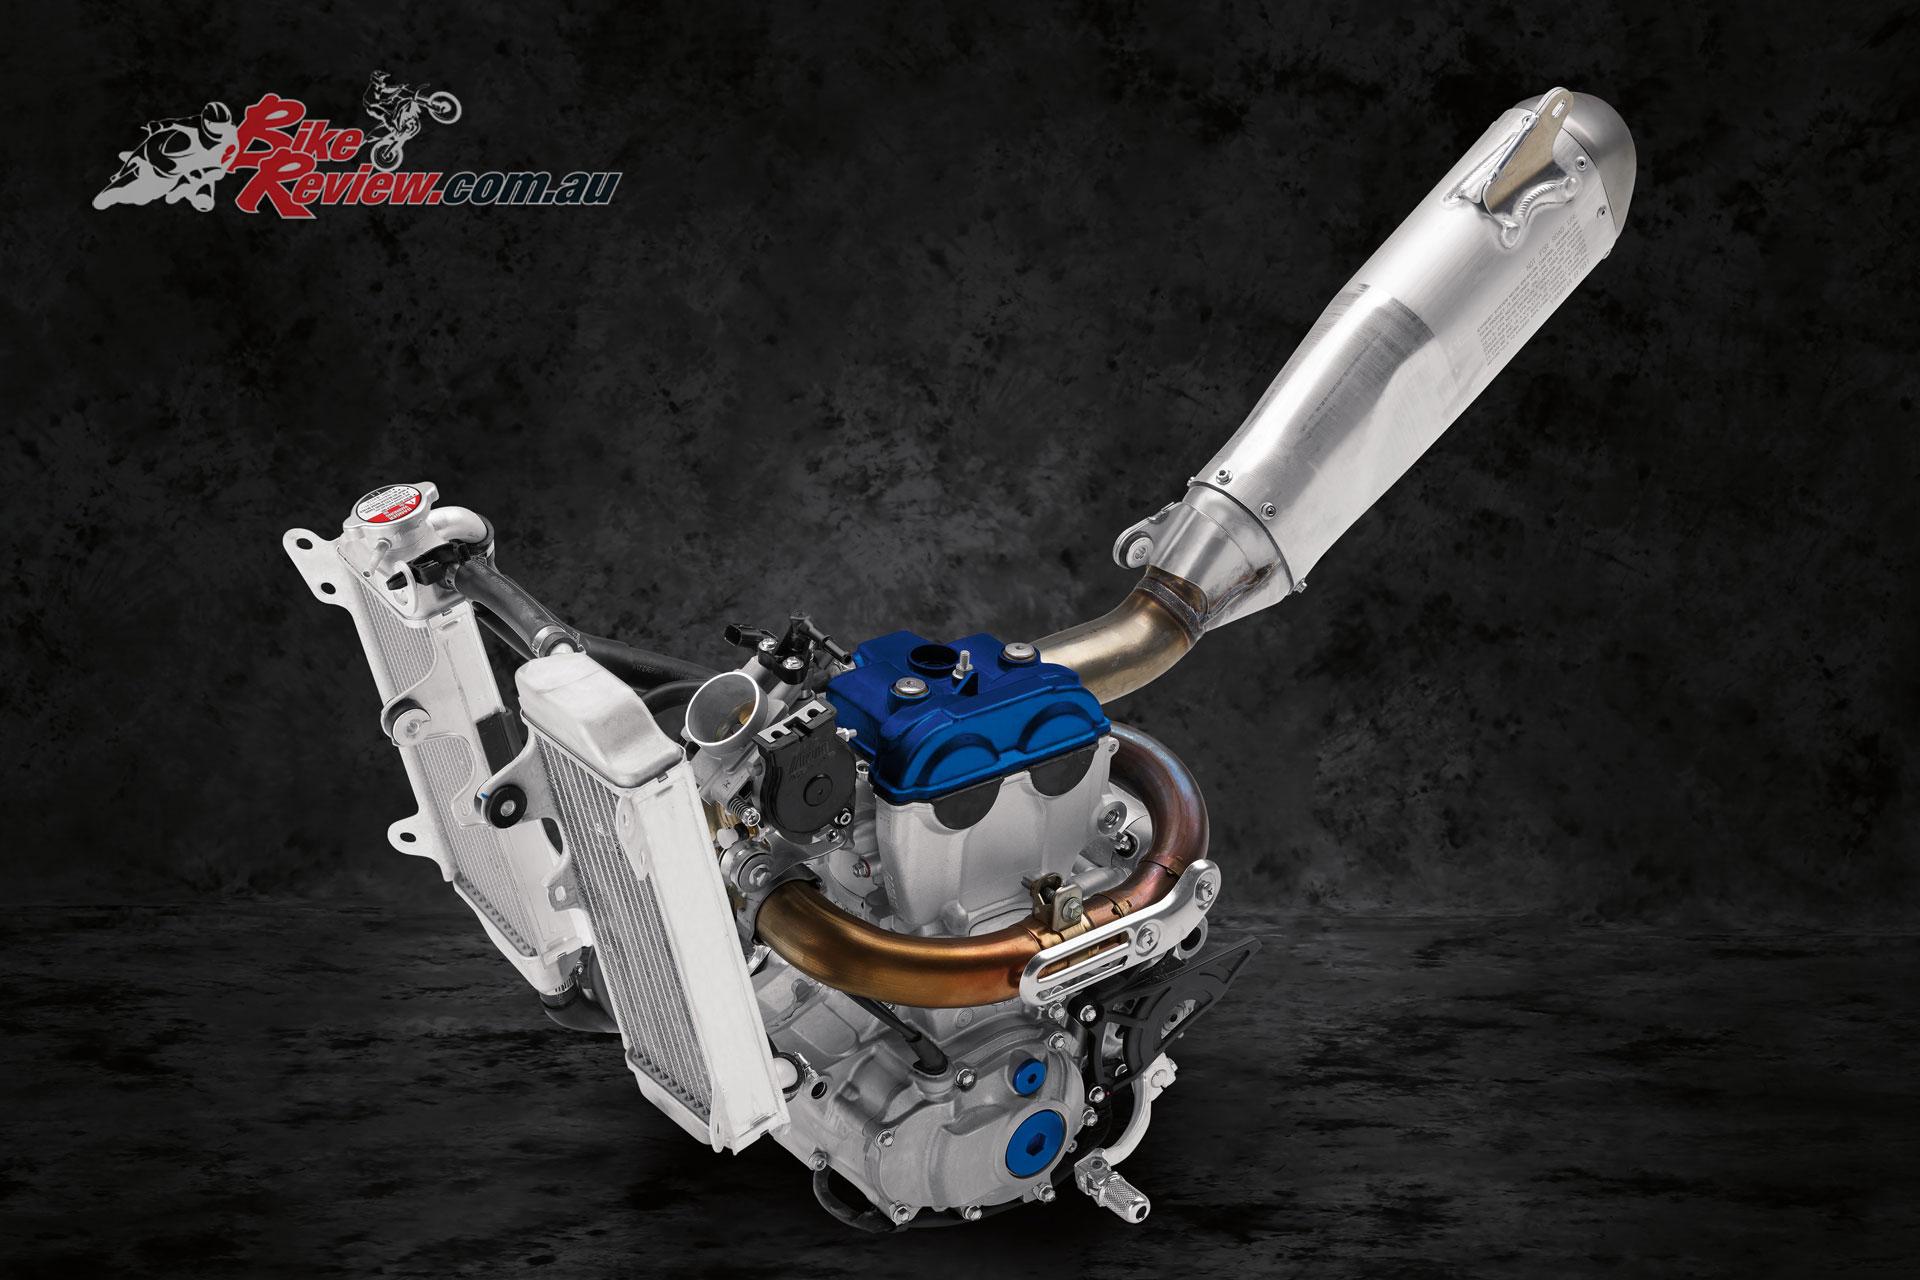 2020 Yamaha YZ250F powerplant